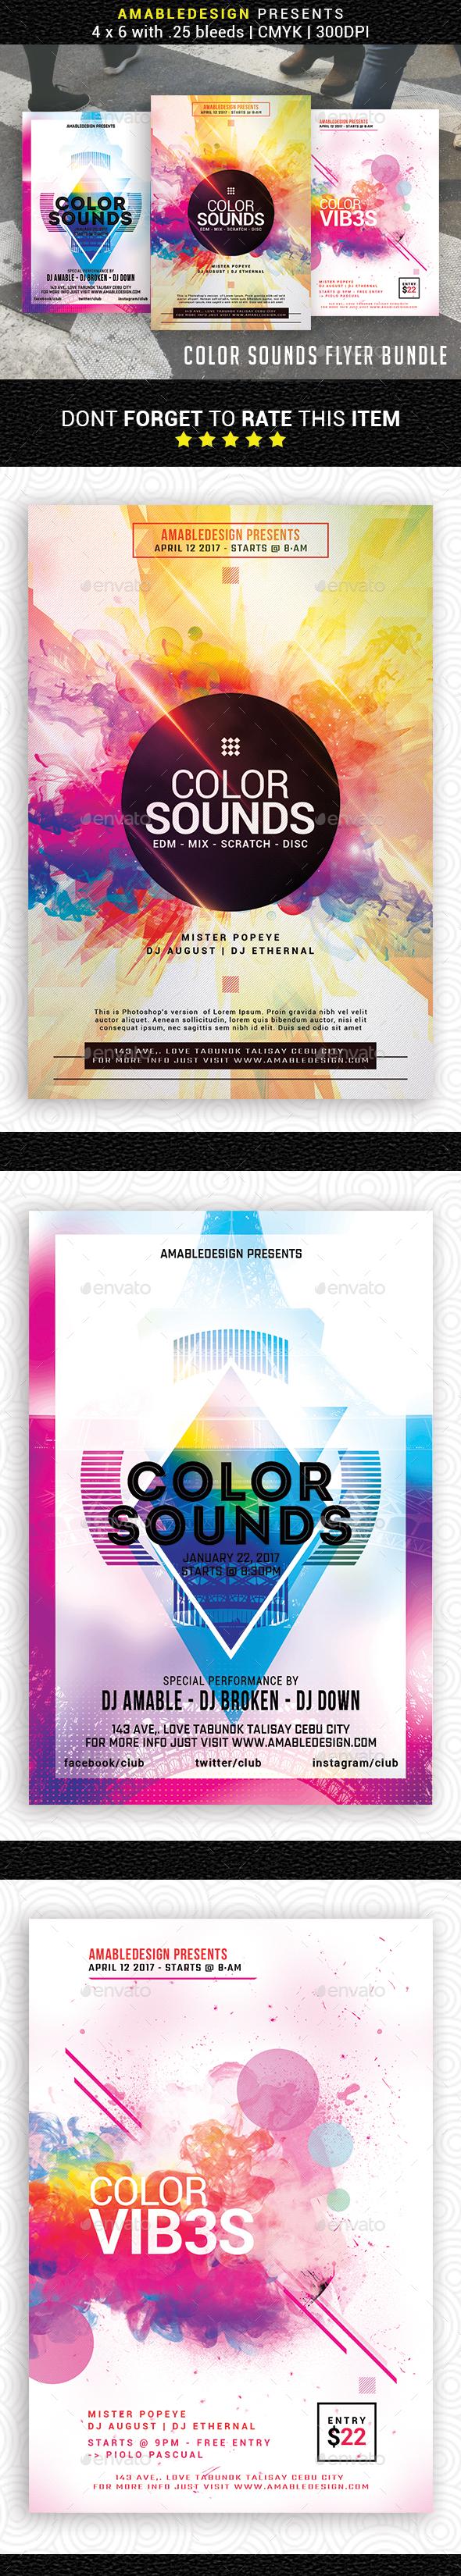 3 in 1 Color Sounds Flyer/Poster Bundle - Events Flyers